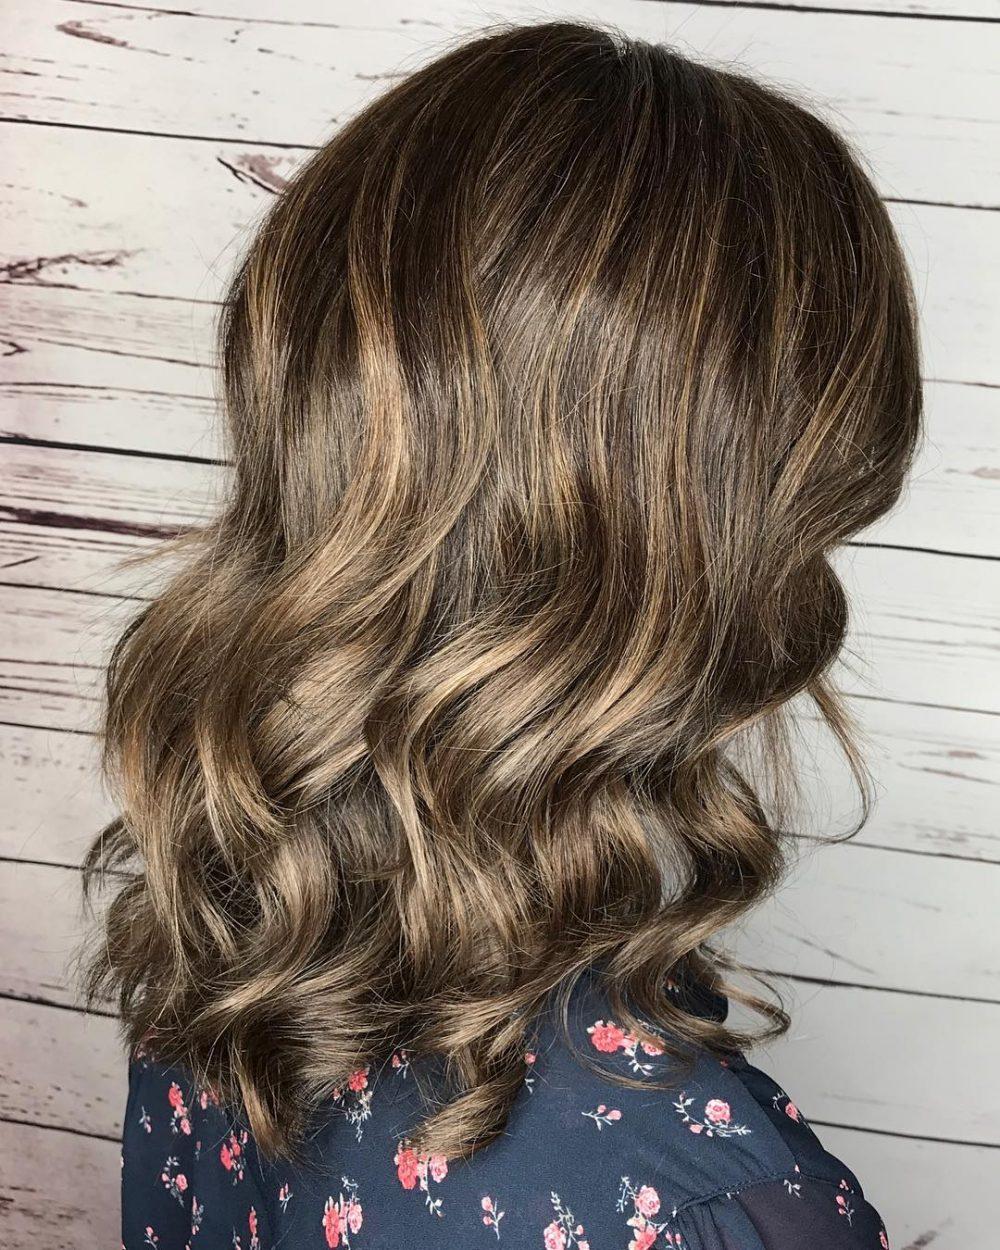 Beautiful Bronde hairstyle